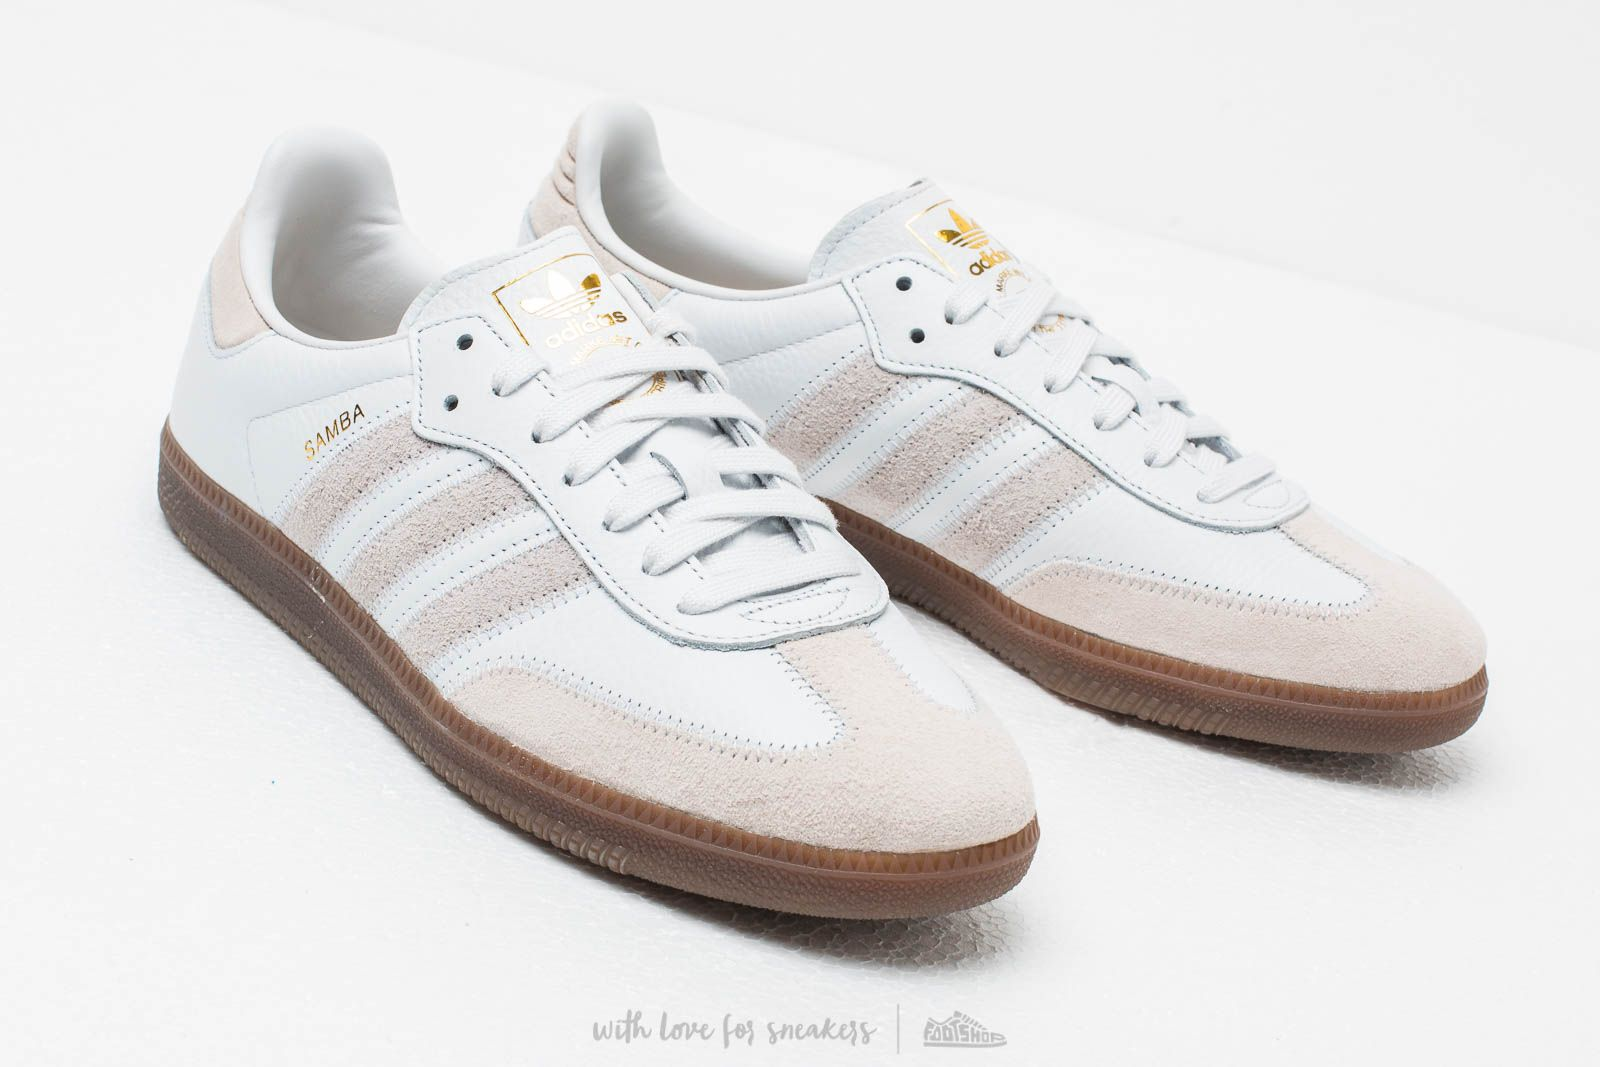 Inseguro Mojado lineal  Men's shoes adidas Samba Og Ft Crystal White/ Raw White/ Gold Metalic    Footshop